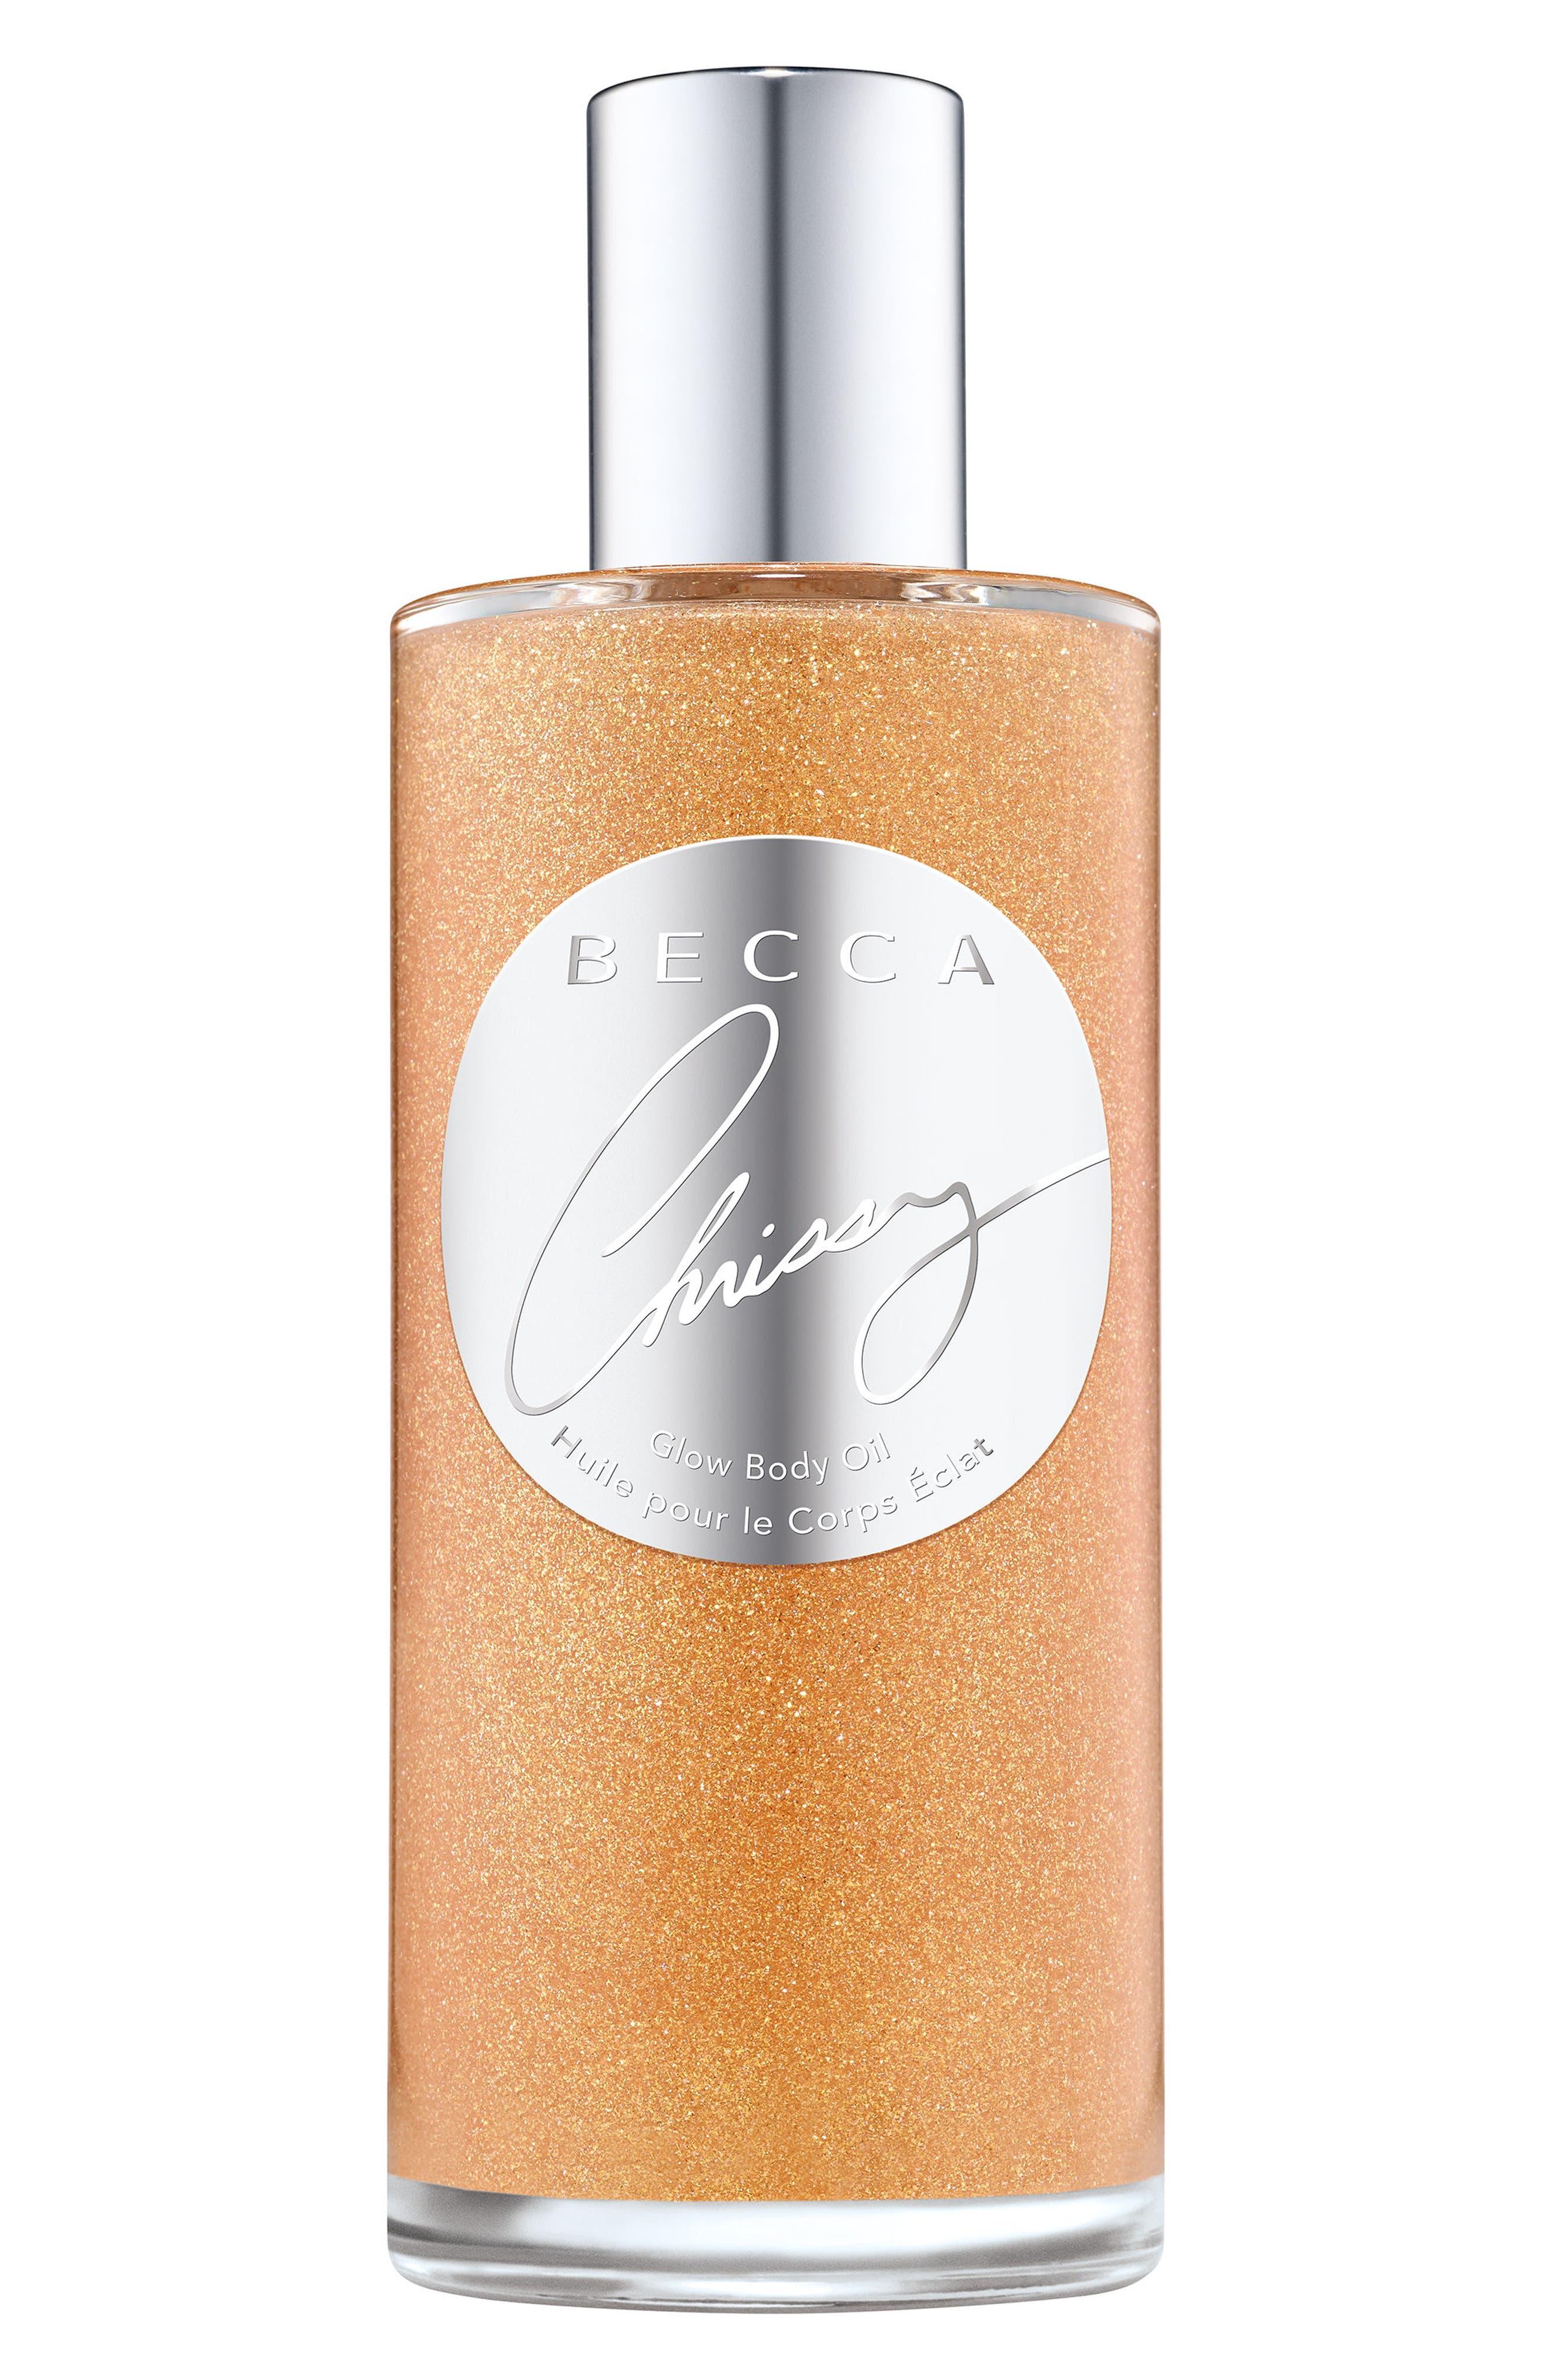 BECCA x Chrissy Teigen Glow Body Oil,                         Main,                         color, NO COLOR